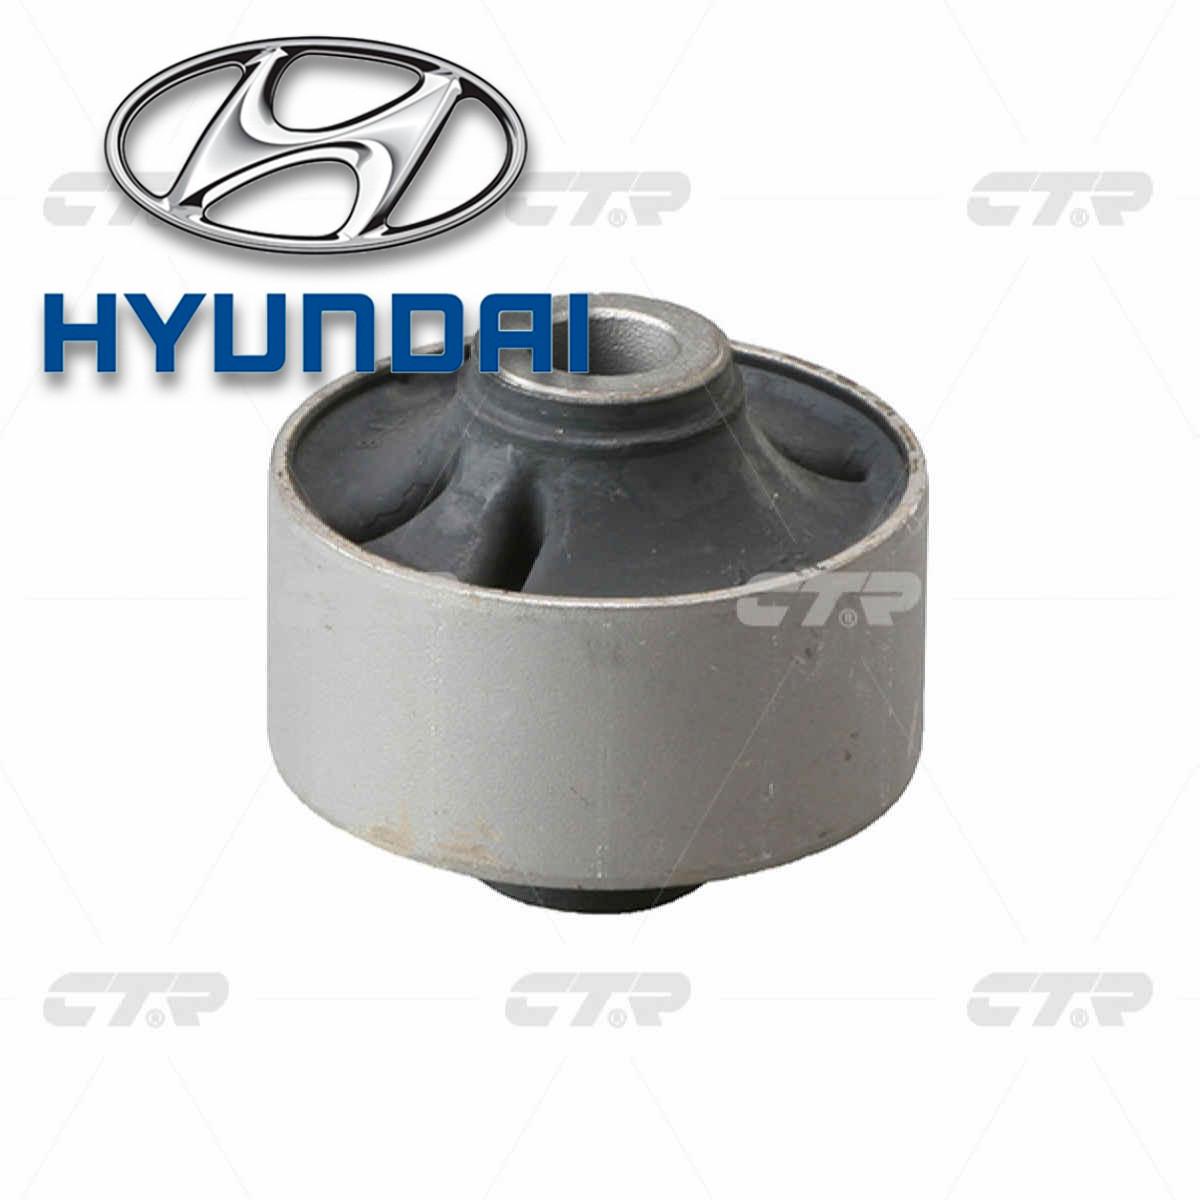 Сайлентблок рычага на Click HYUNDAI CTR Корея CVKH-40